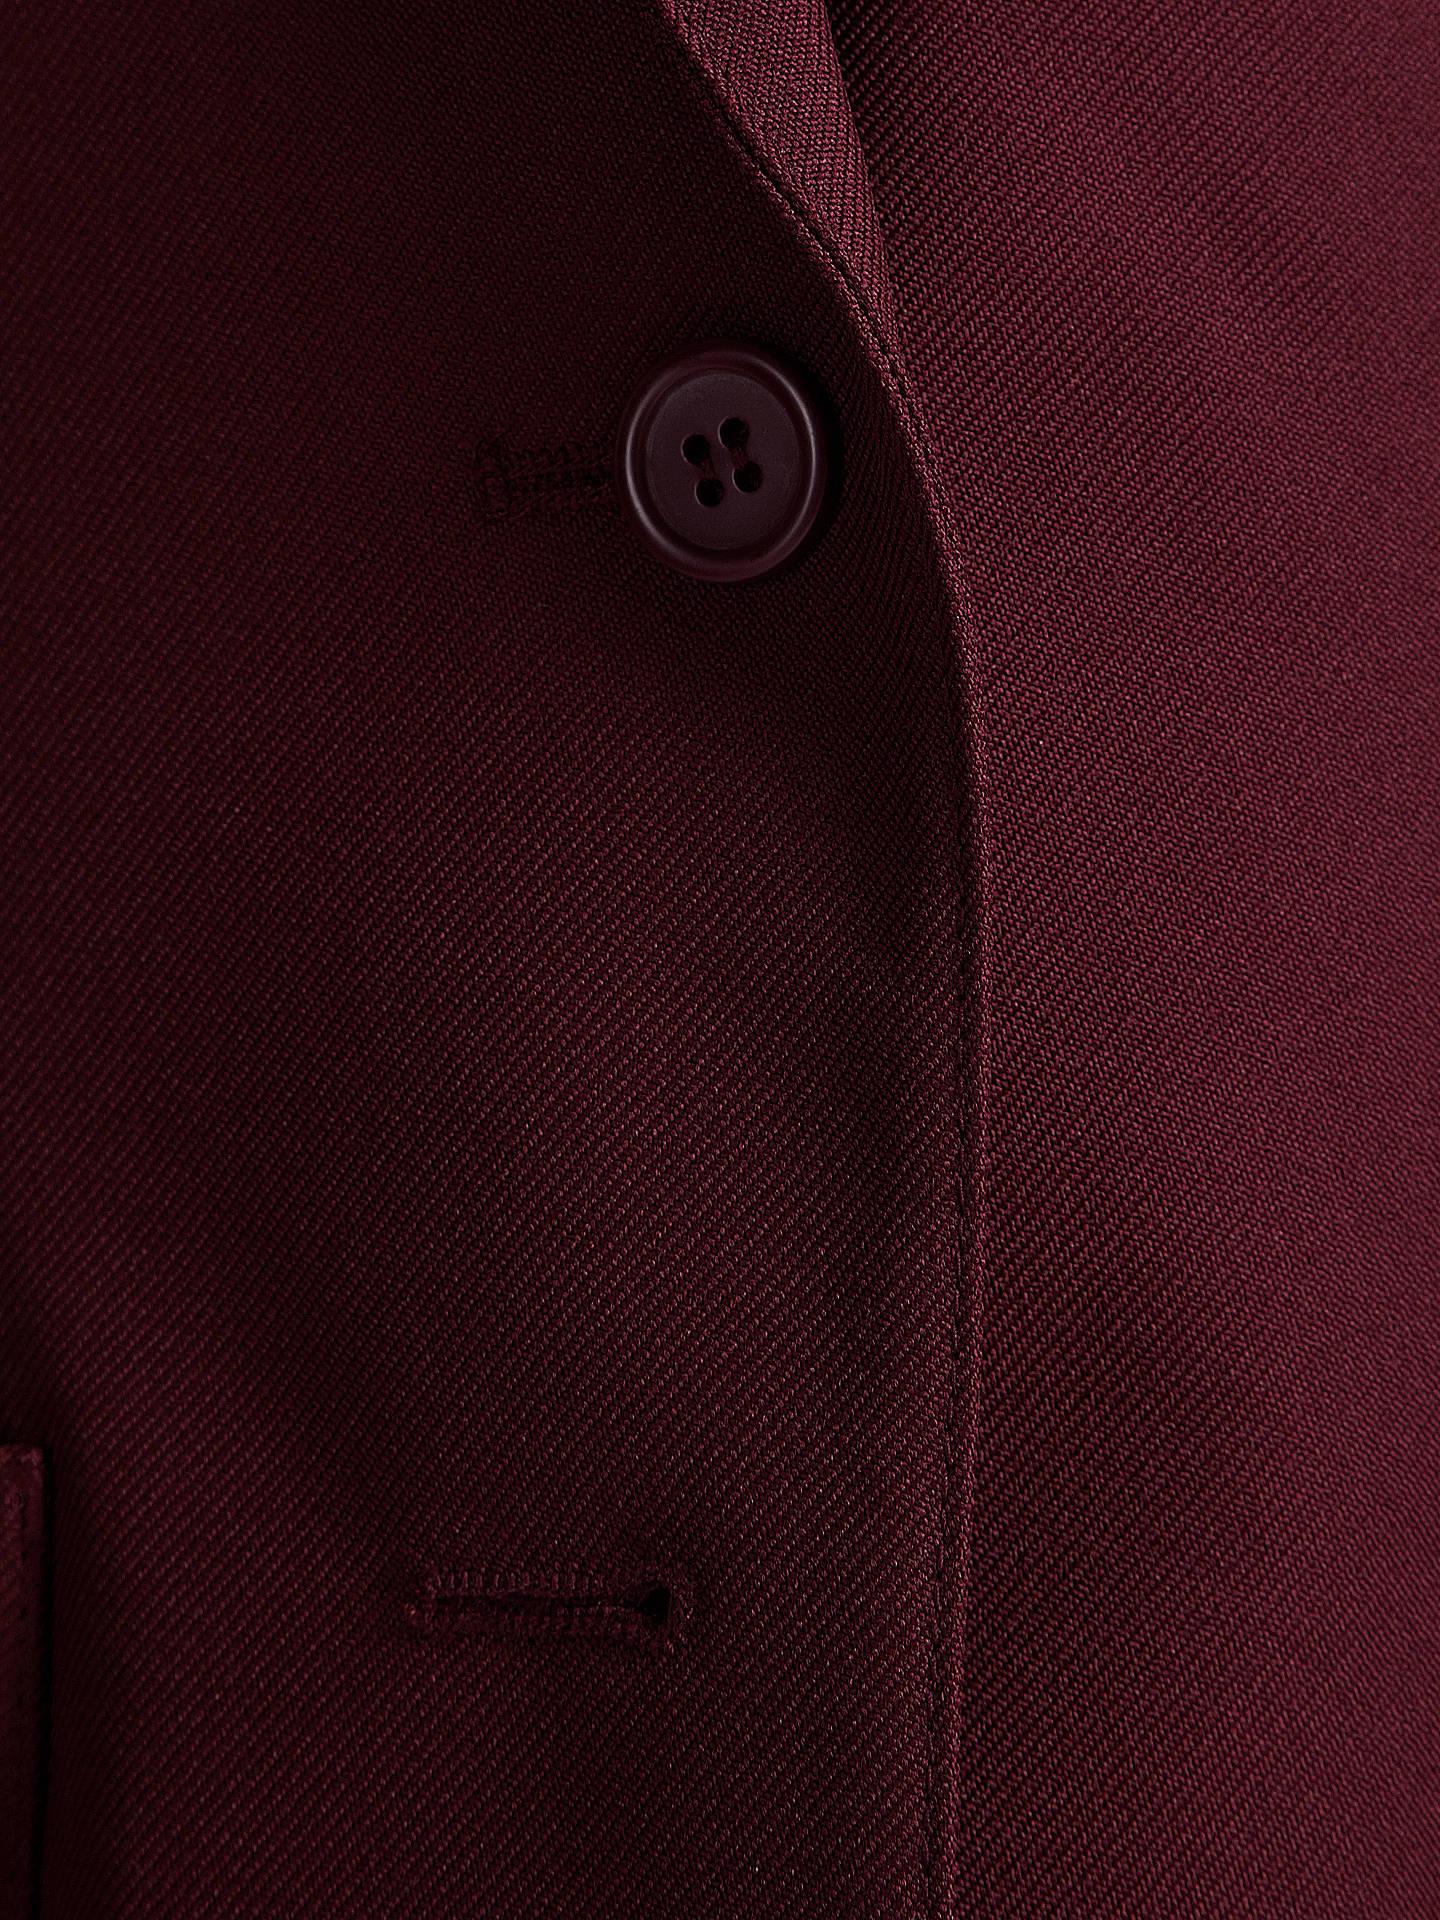 74cm = 29 Girls Maroon Polyester School Blazer